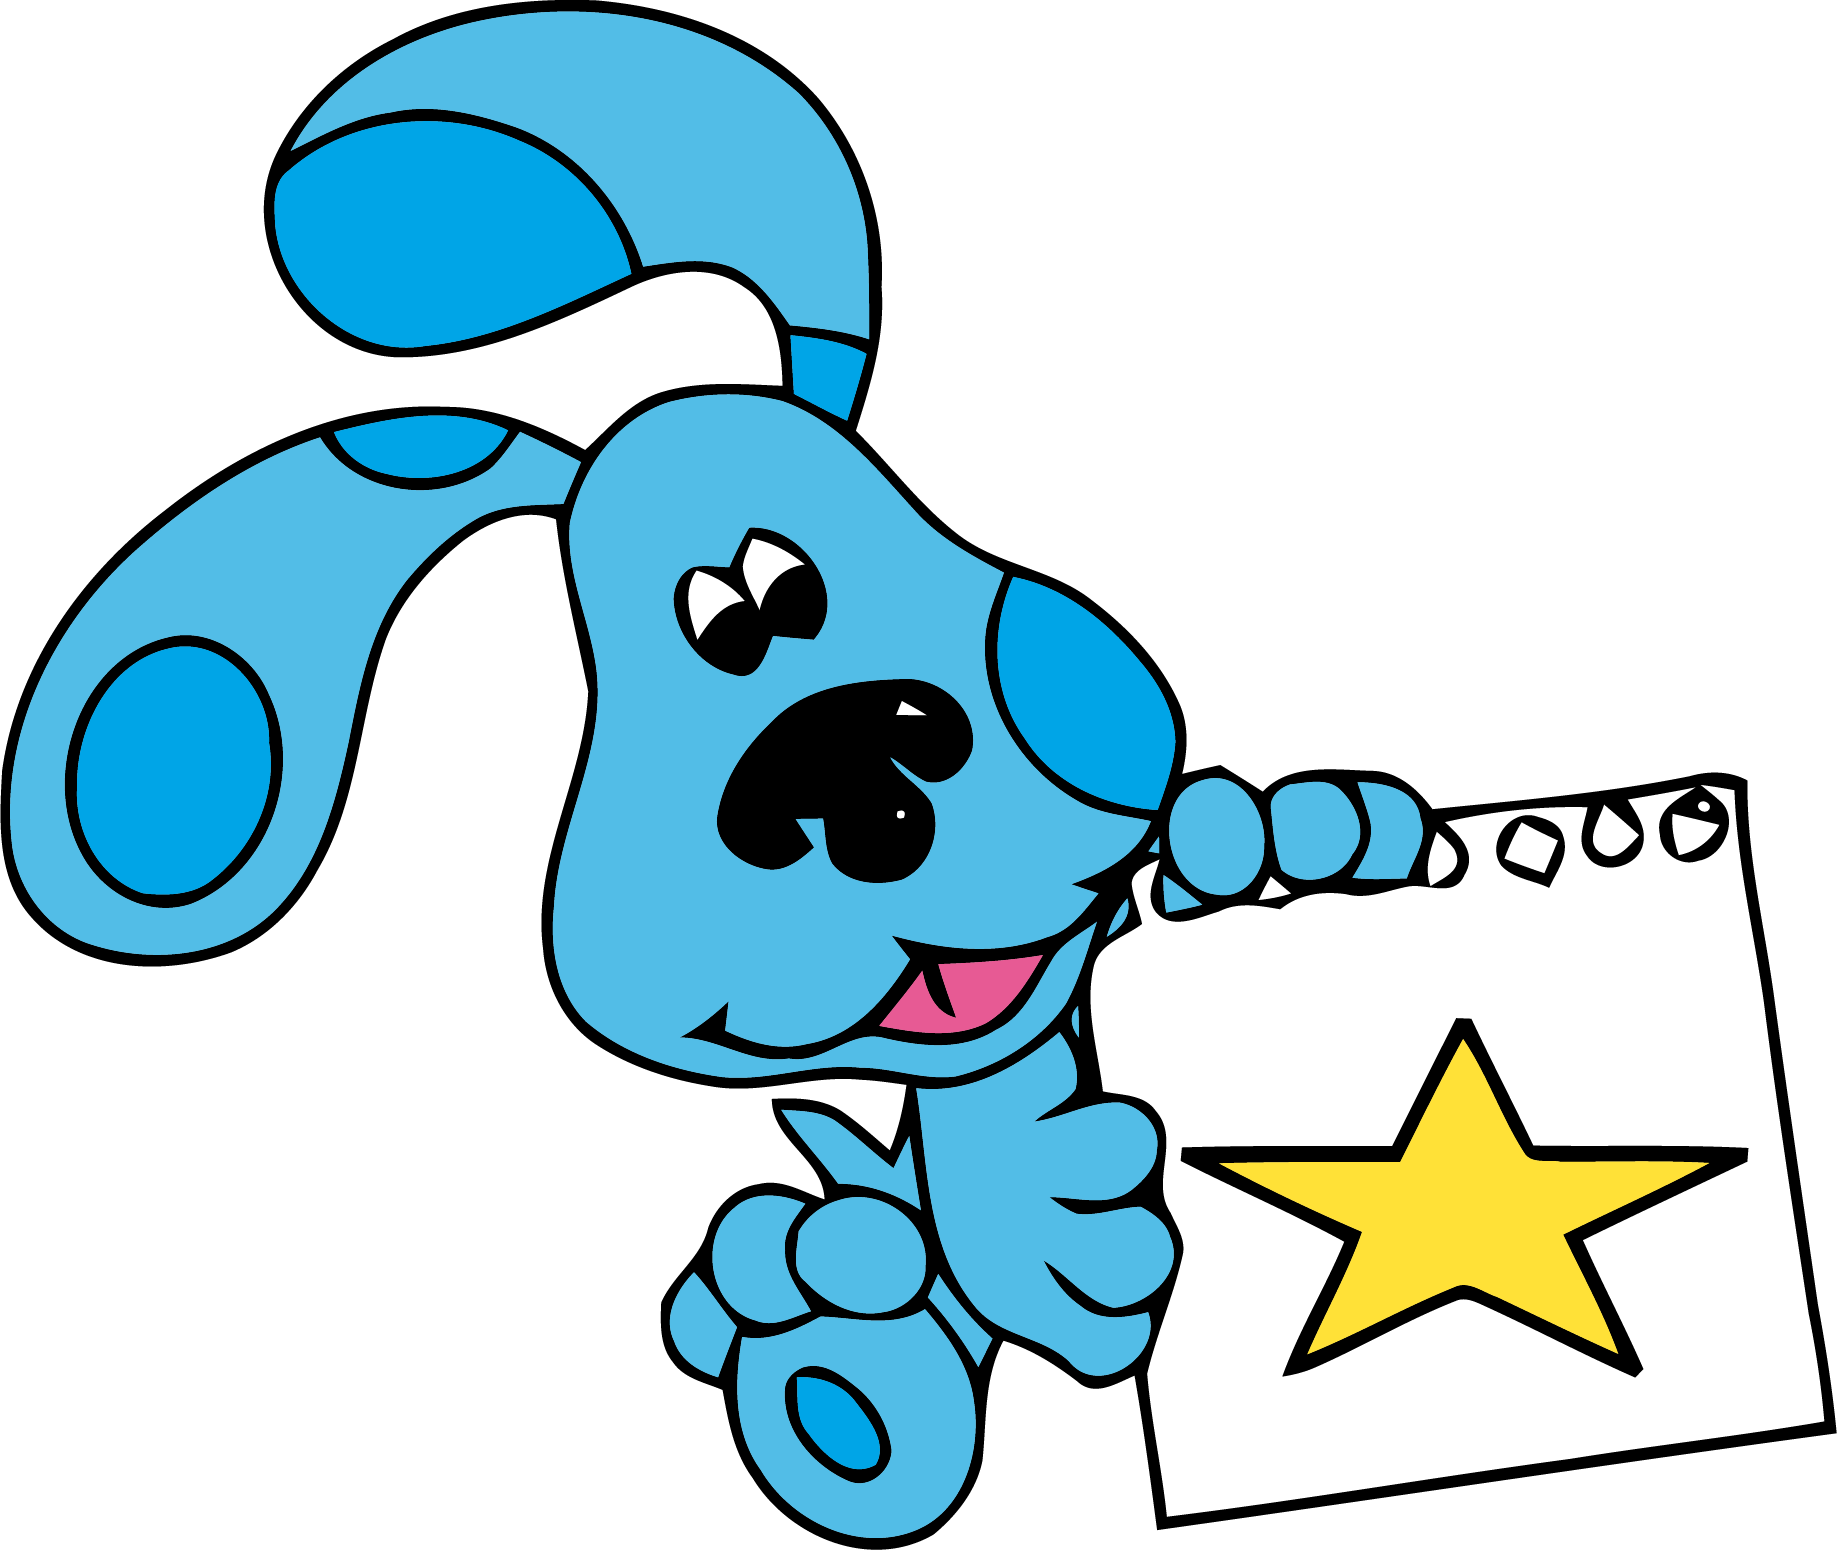 1837x1550 Blue's Clues Clip Art Star Clipart Png